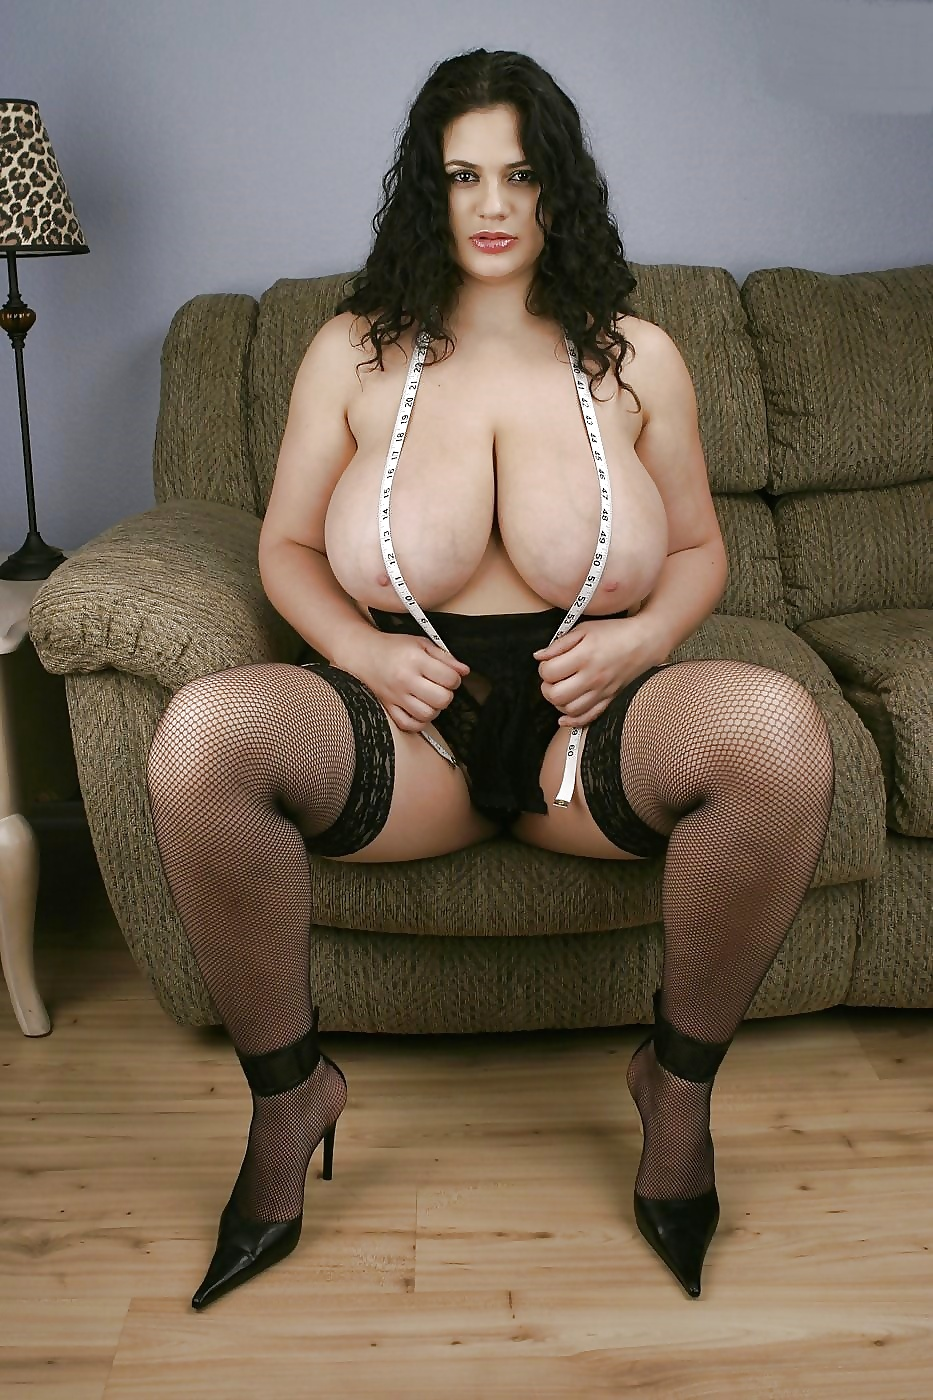 italian-bbw-chubby-pussy-bent